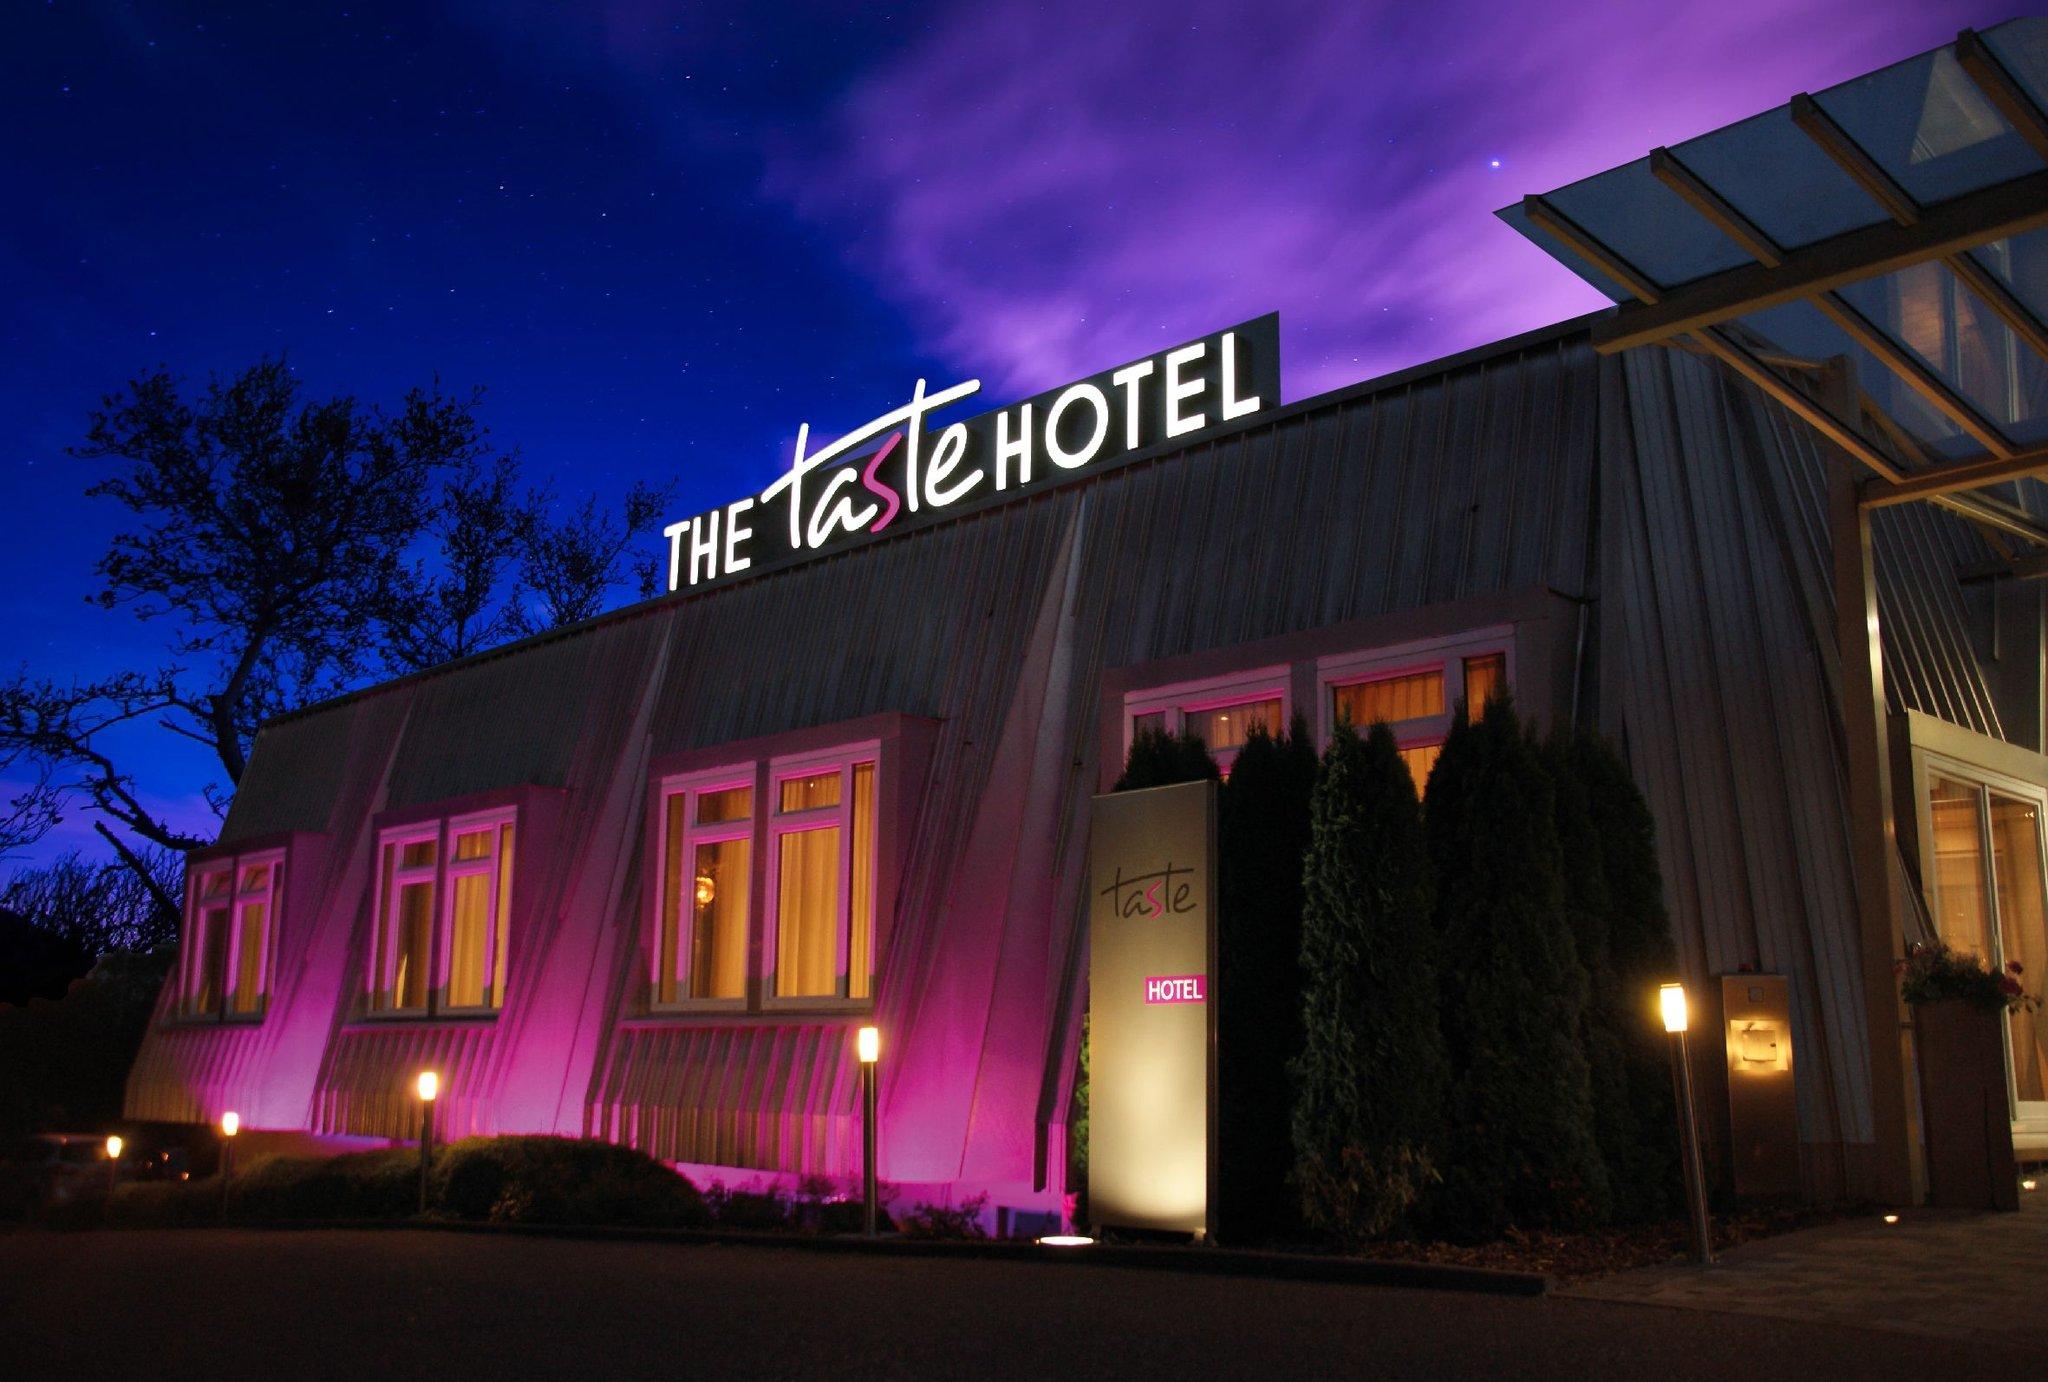 The Taste Hotel